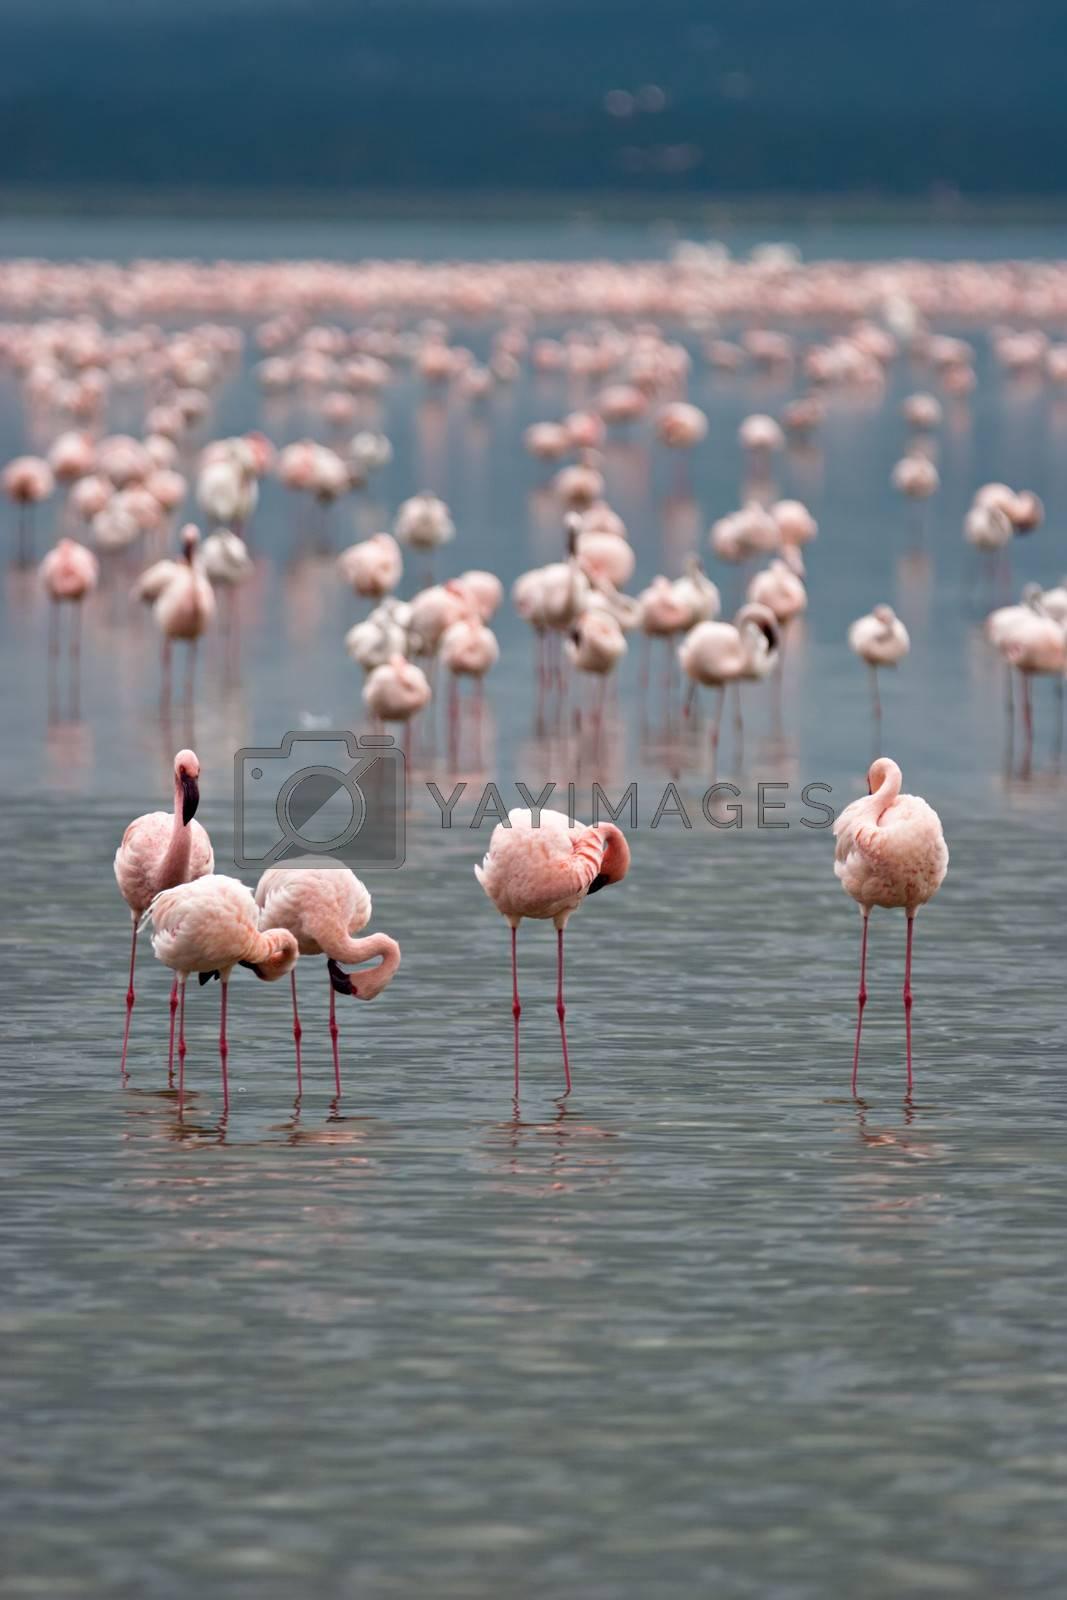 Flamingos on Lake Nakuru, Kenya. Scientific name: Phoenicopterus minor